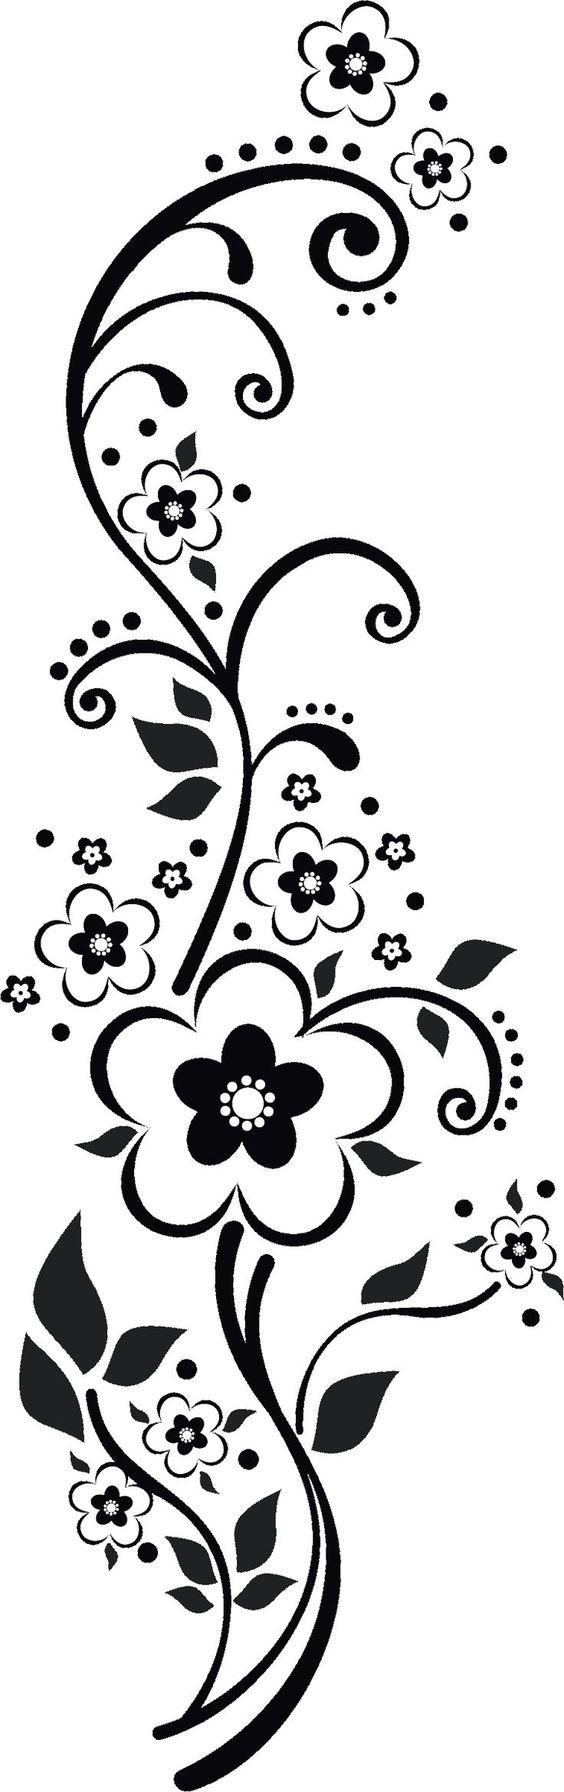 Floral swirl patterns - photo#51